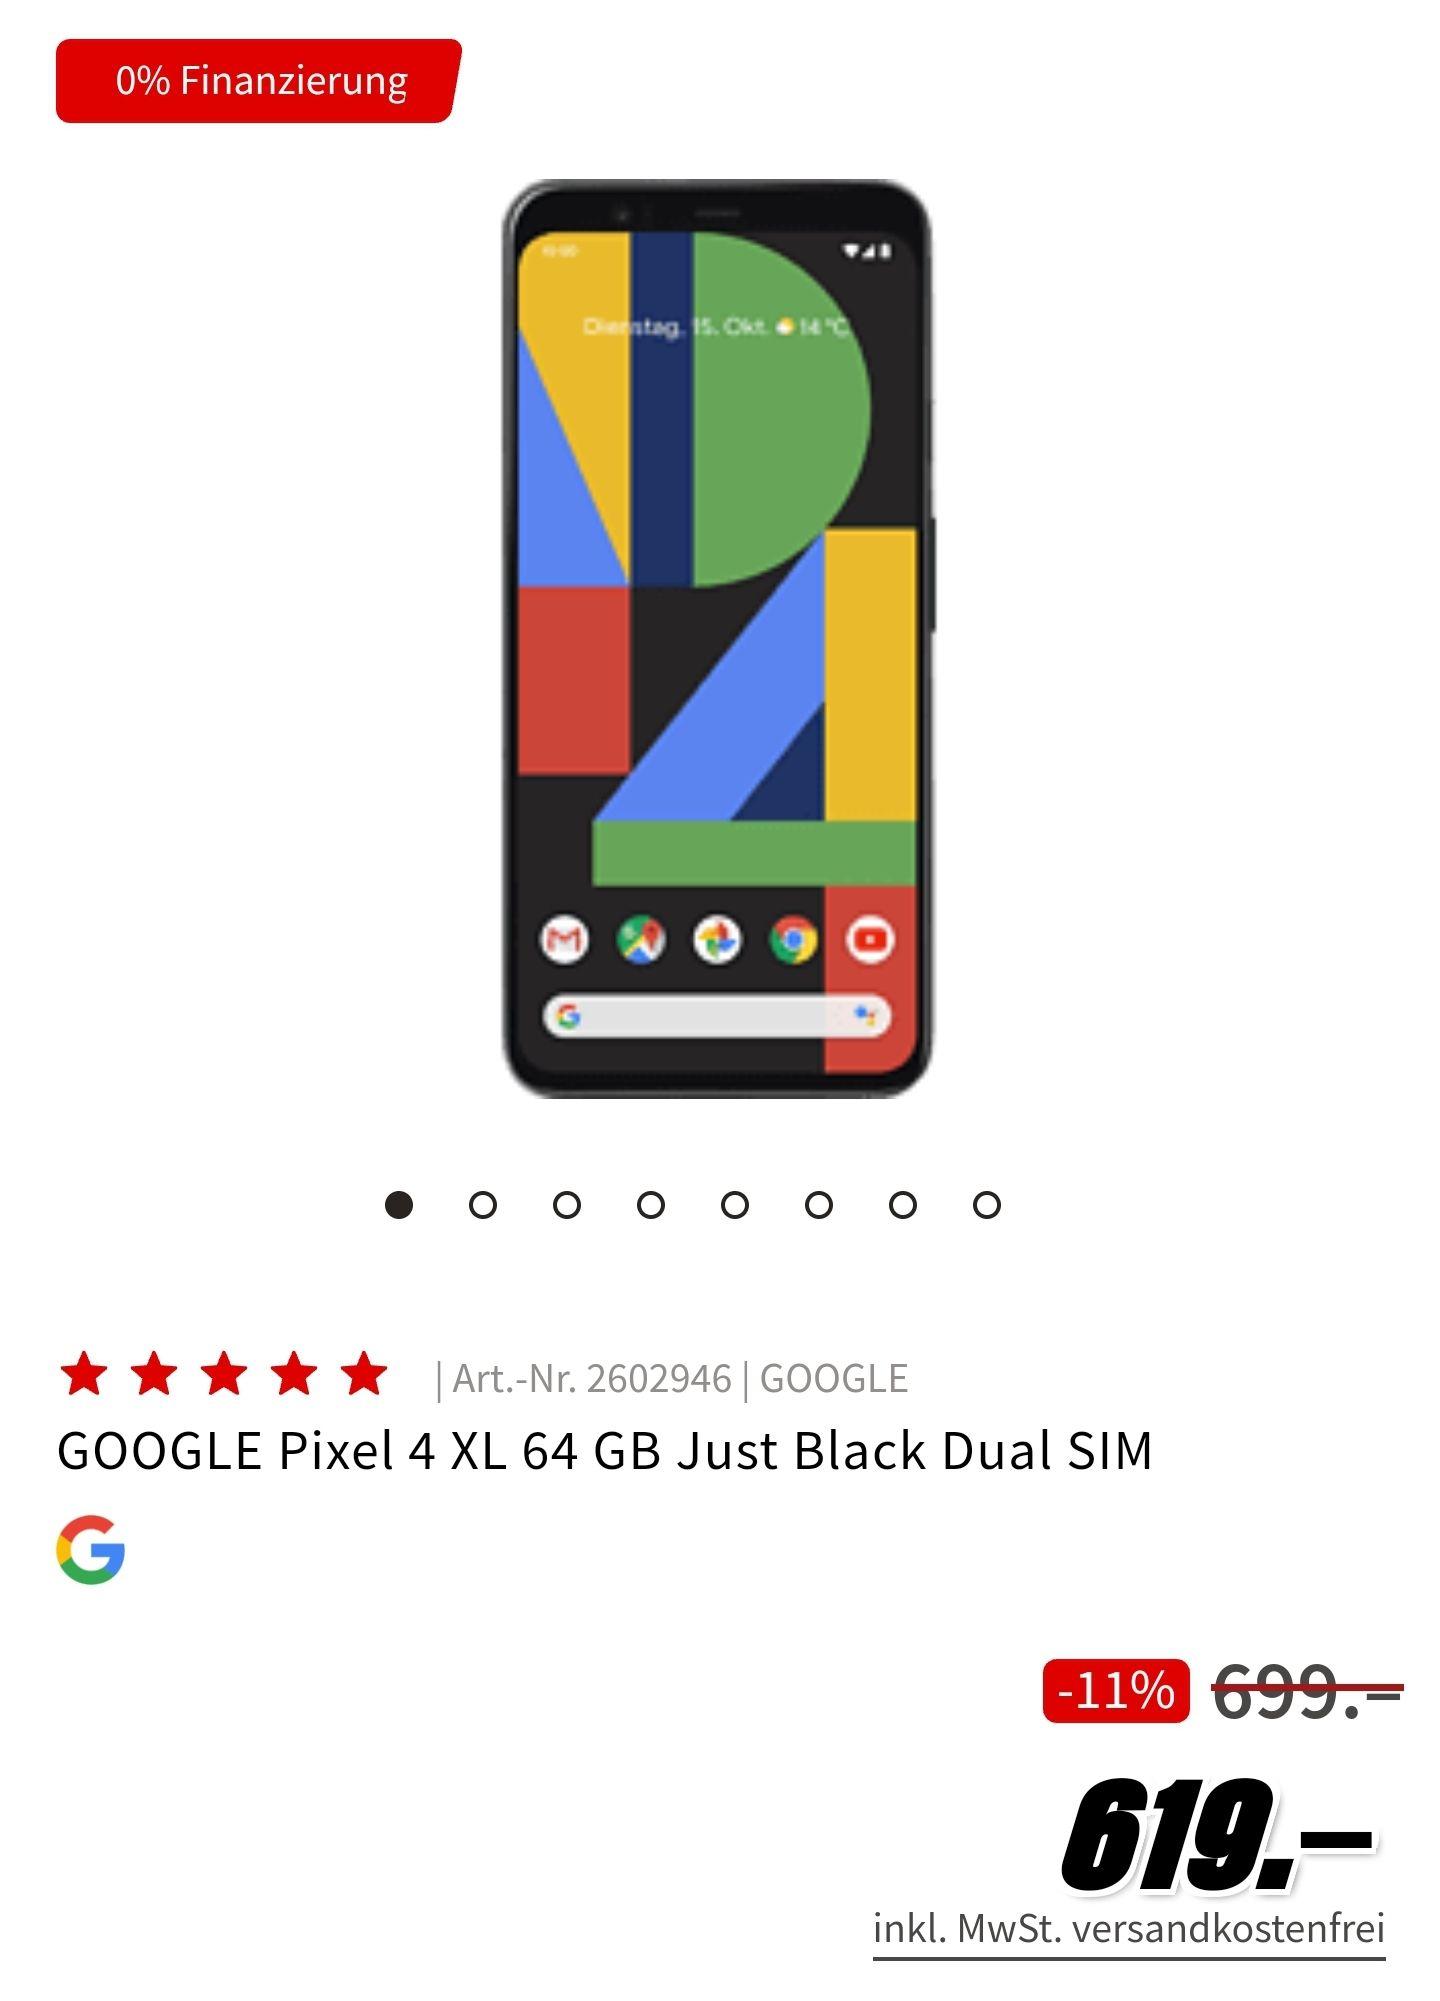 GOOGLE Pixel 4XL bei Media Markt